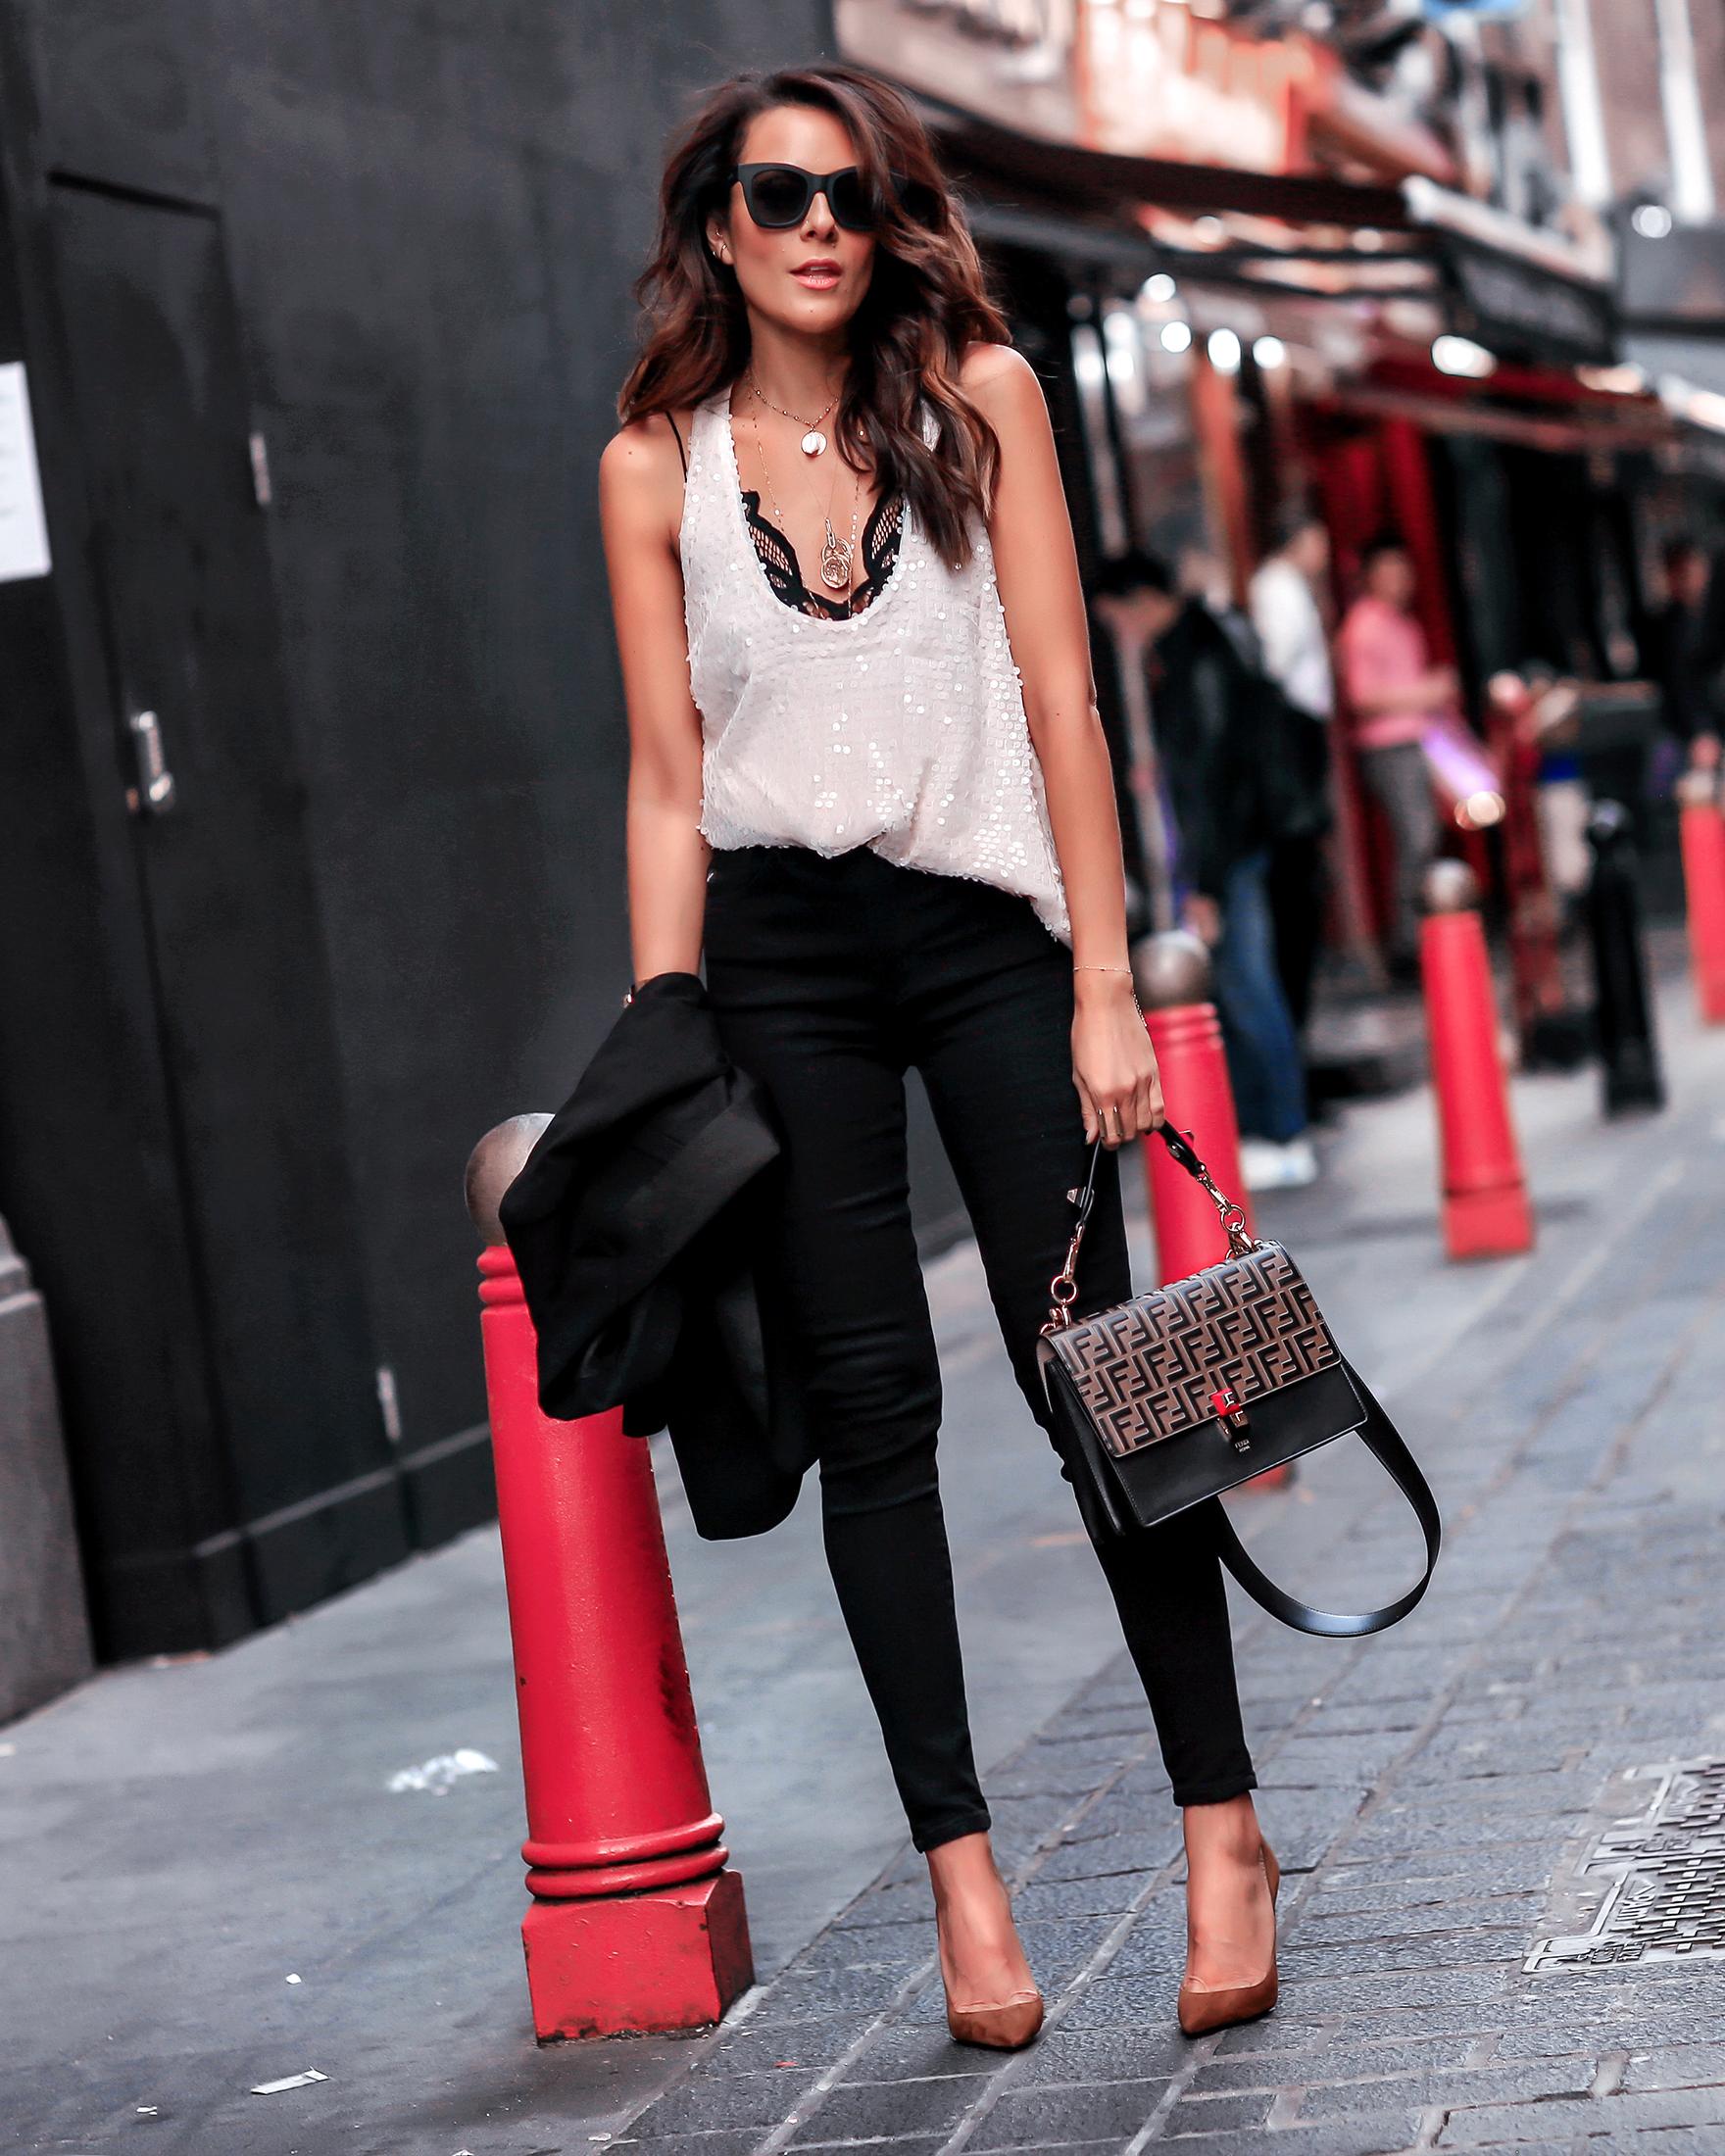 Brunette Woman In London Wearing VICIDOLLS Sequins Top Fendi Kan Bag